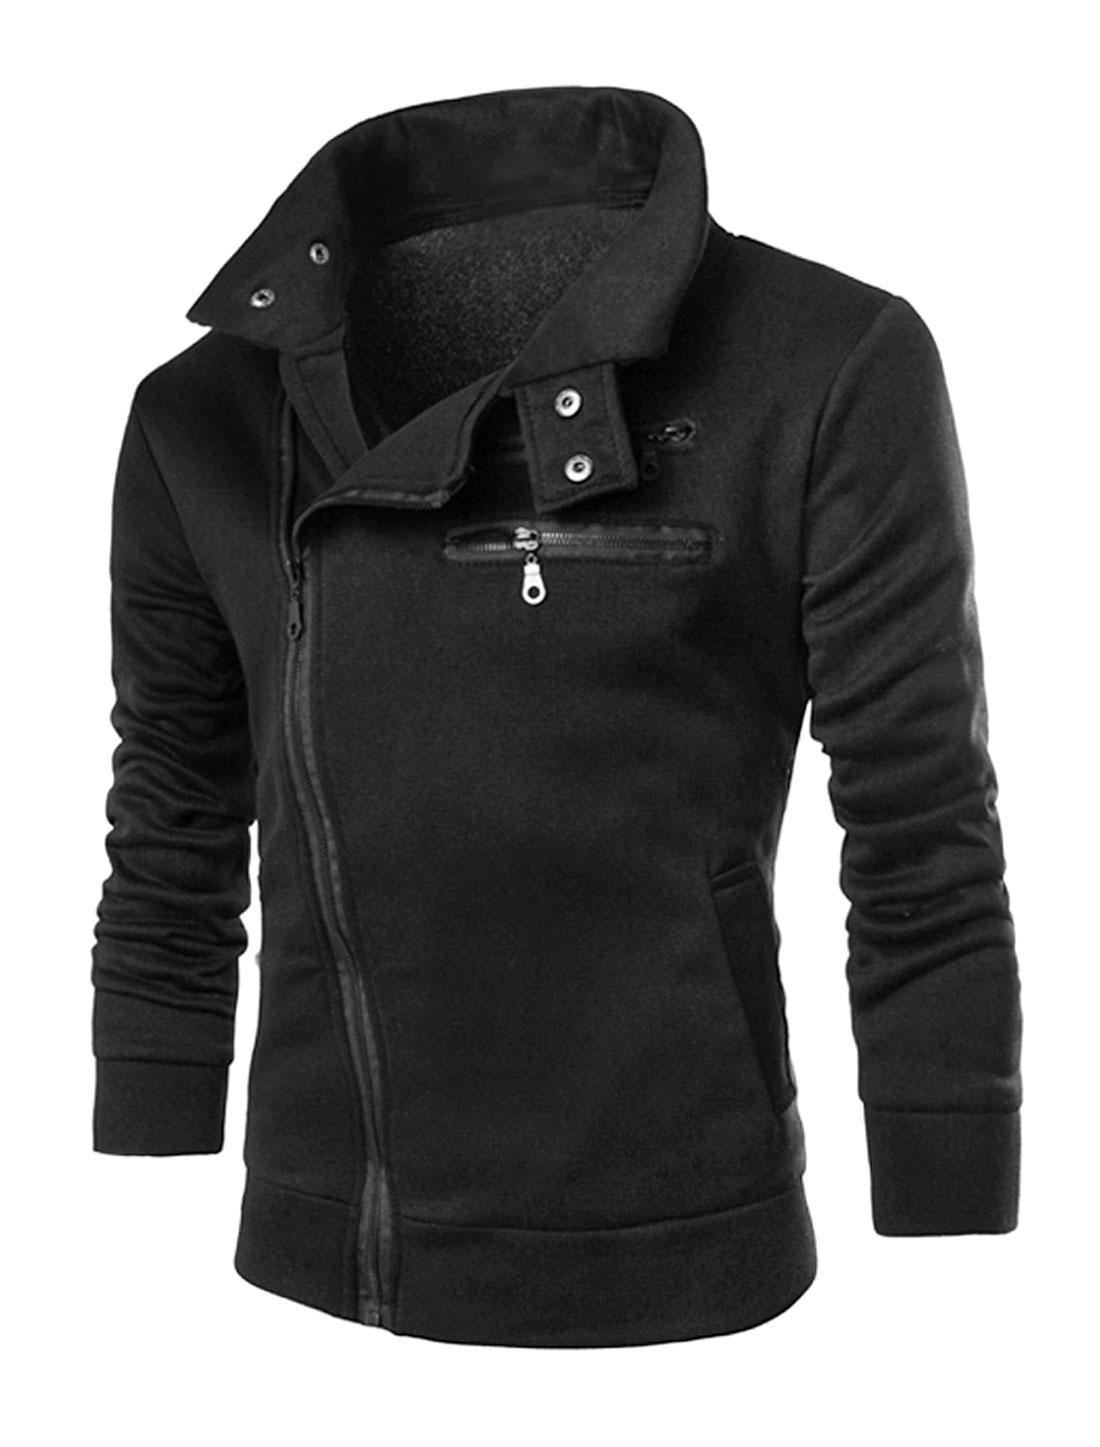 Men Long Sleeve Inclined Zipper Front Pockets Slim Fit Jacket Black M